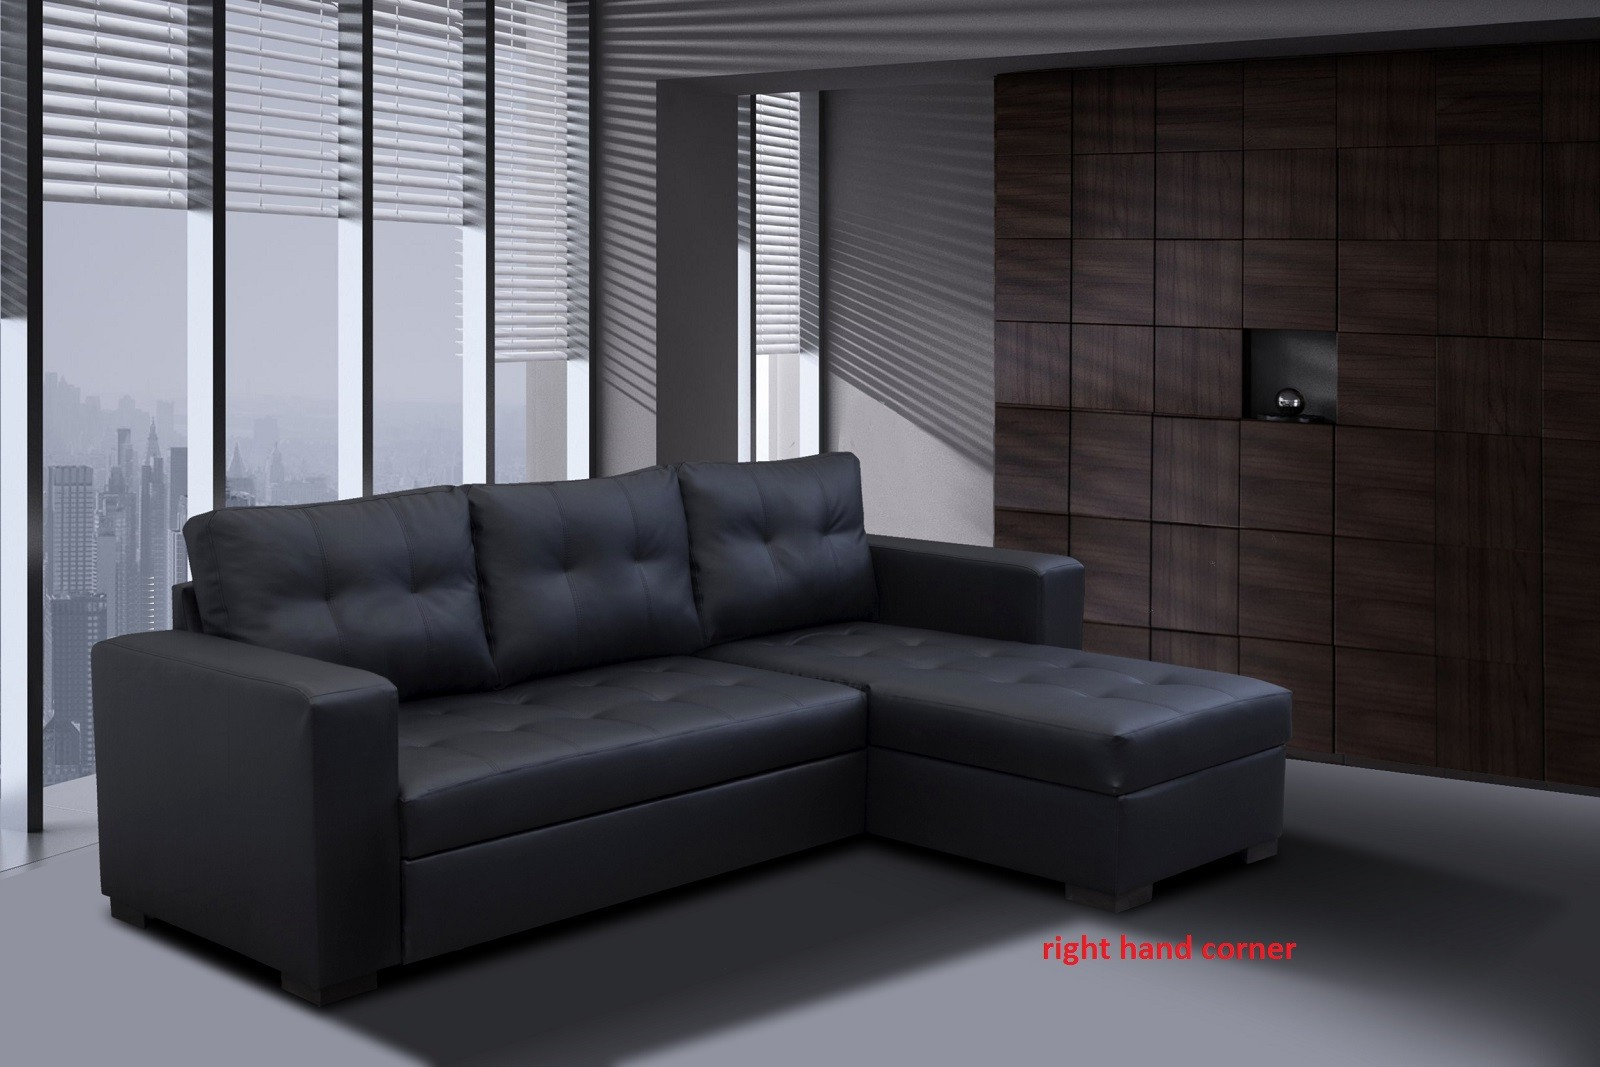 Monza II Right Corner Sofa Bed Black PU